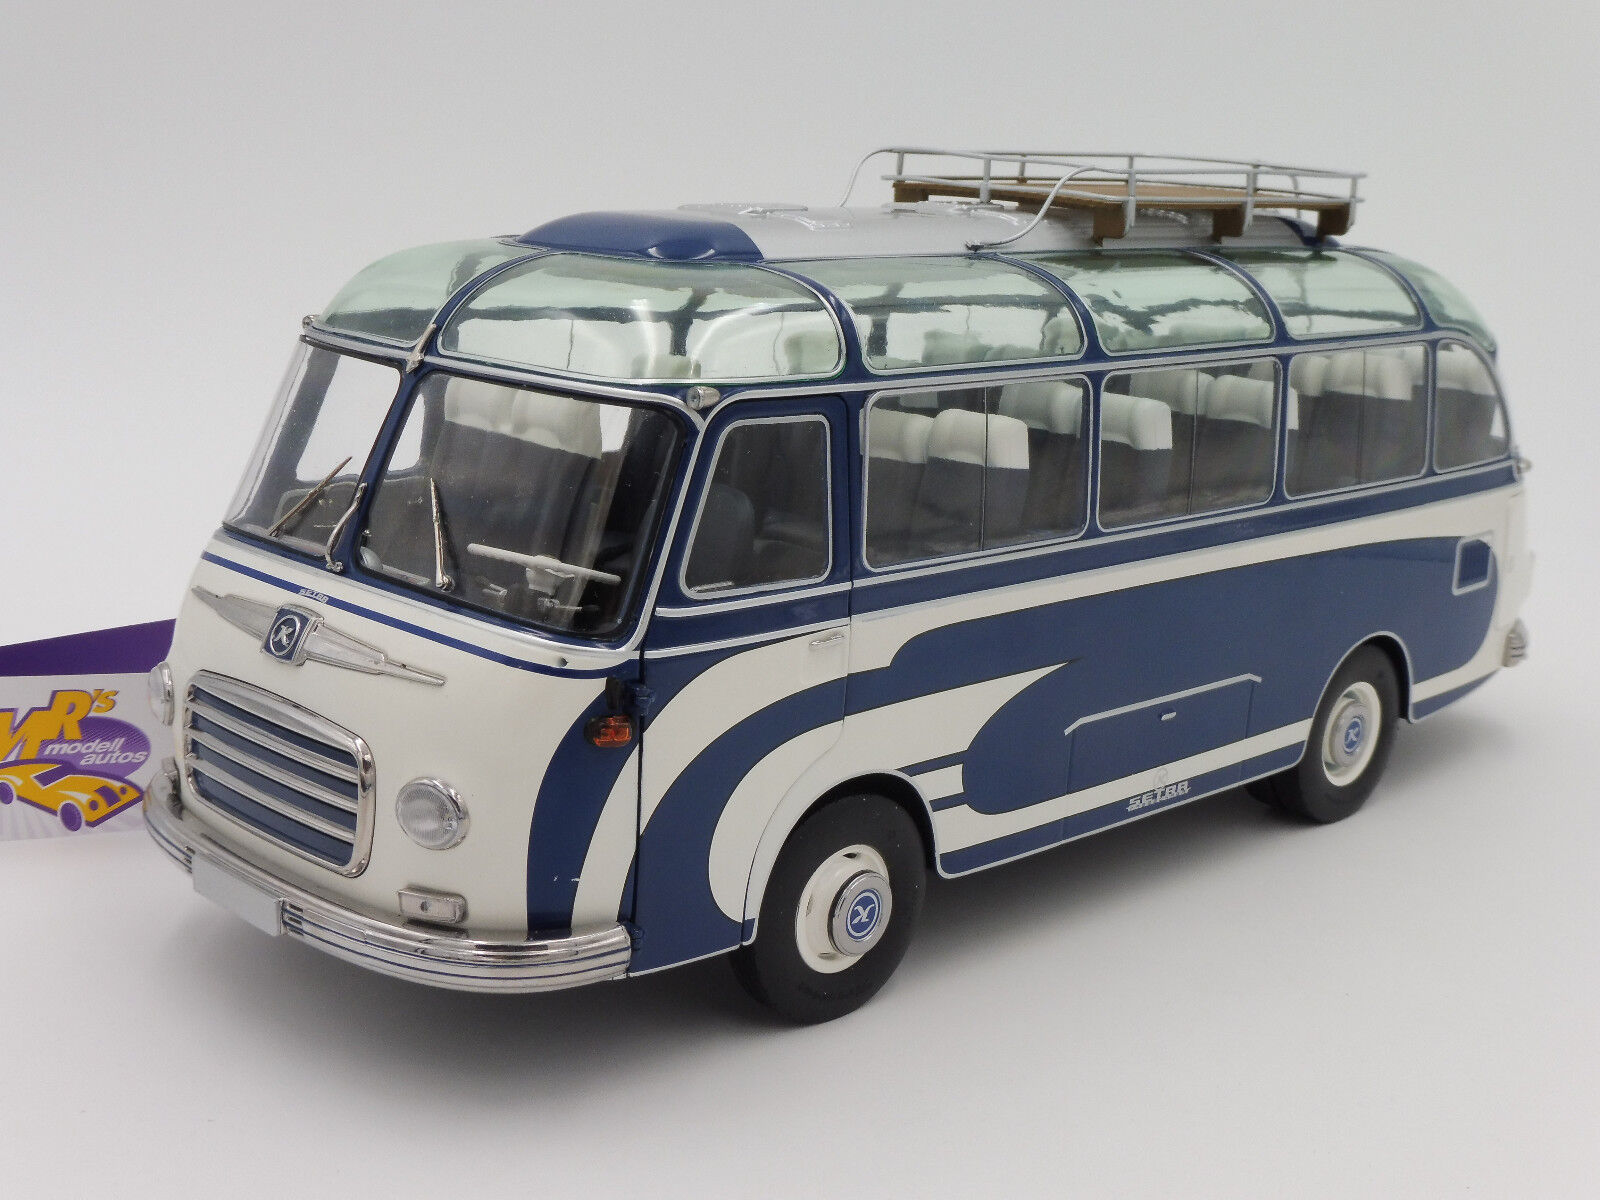 Schuco 00347 # SETRA SETRA SETRA s6 Autocar année de fabrication 1963 in